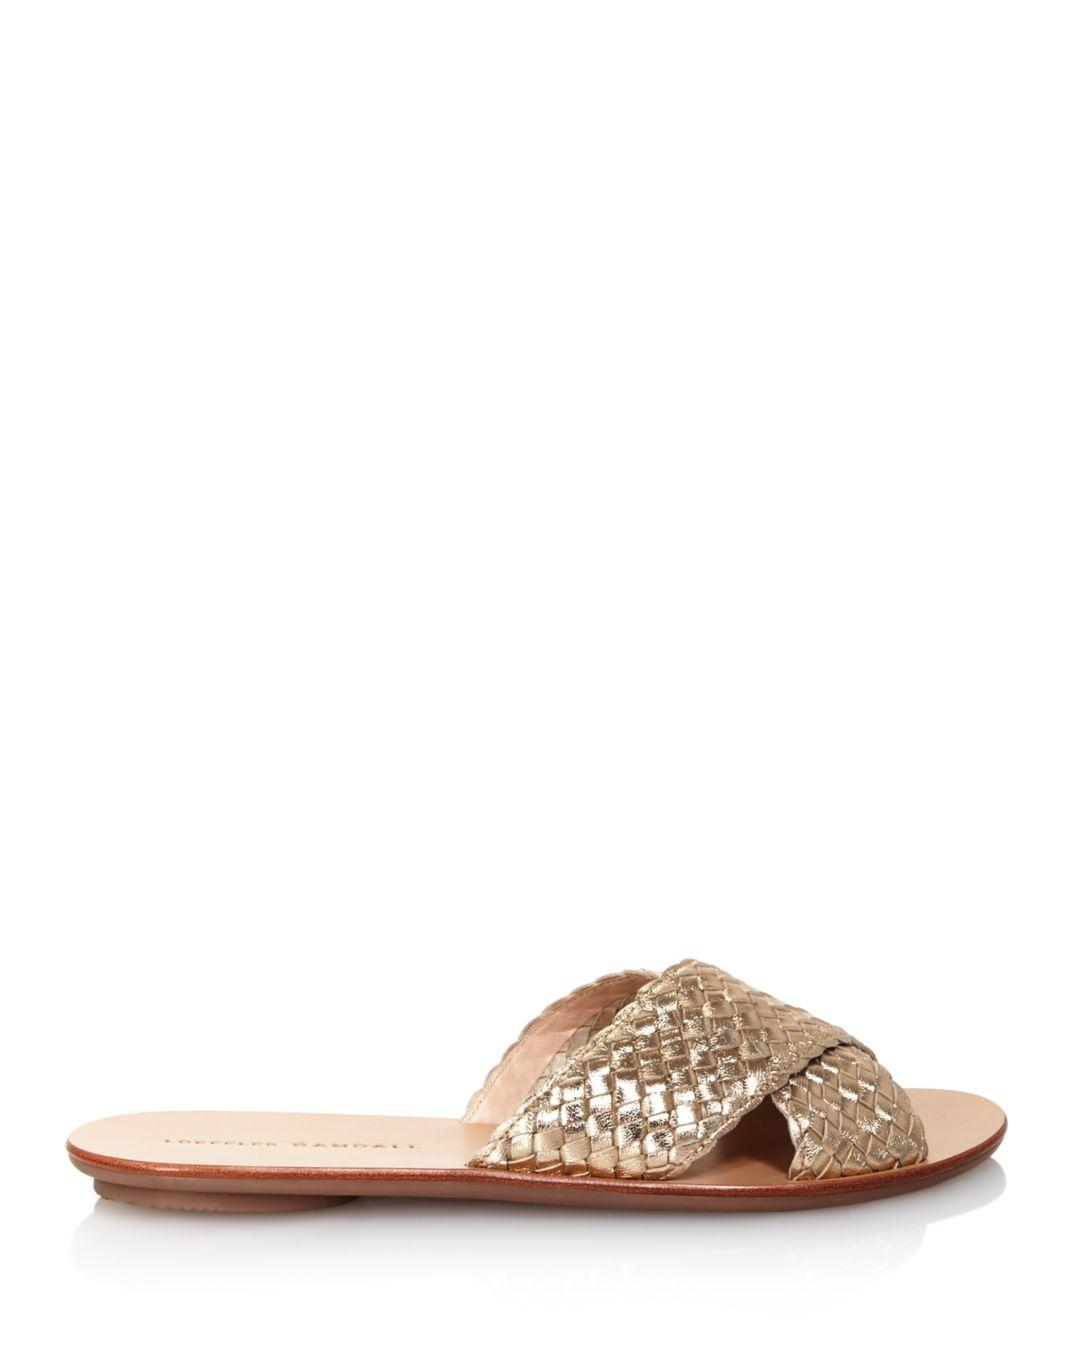 26000153fed5 Lyst - Loeffler Randall Women s Claudie Metallic Woven Leather Slide Sandals